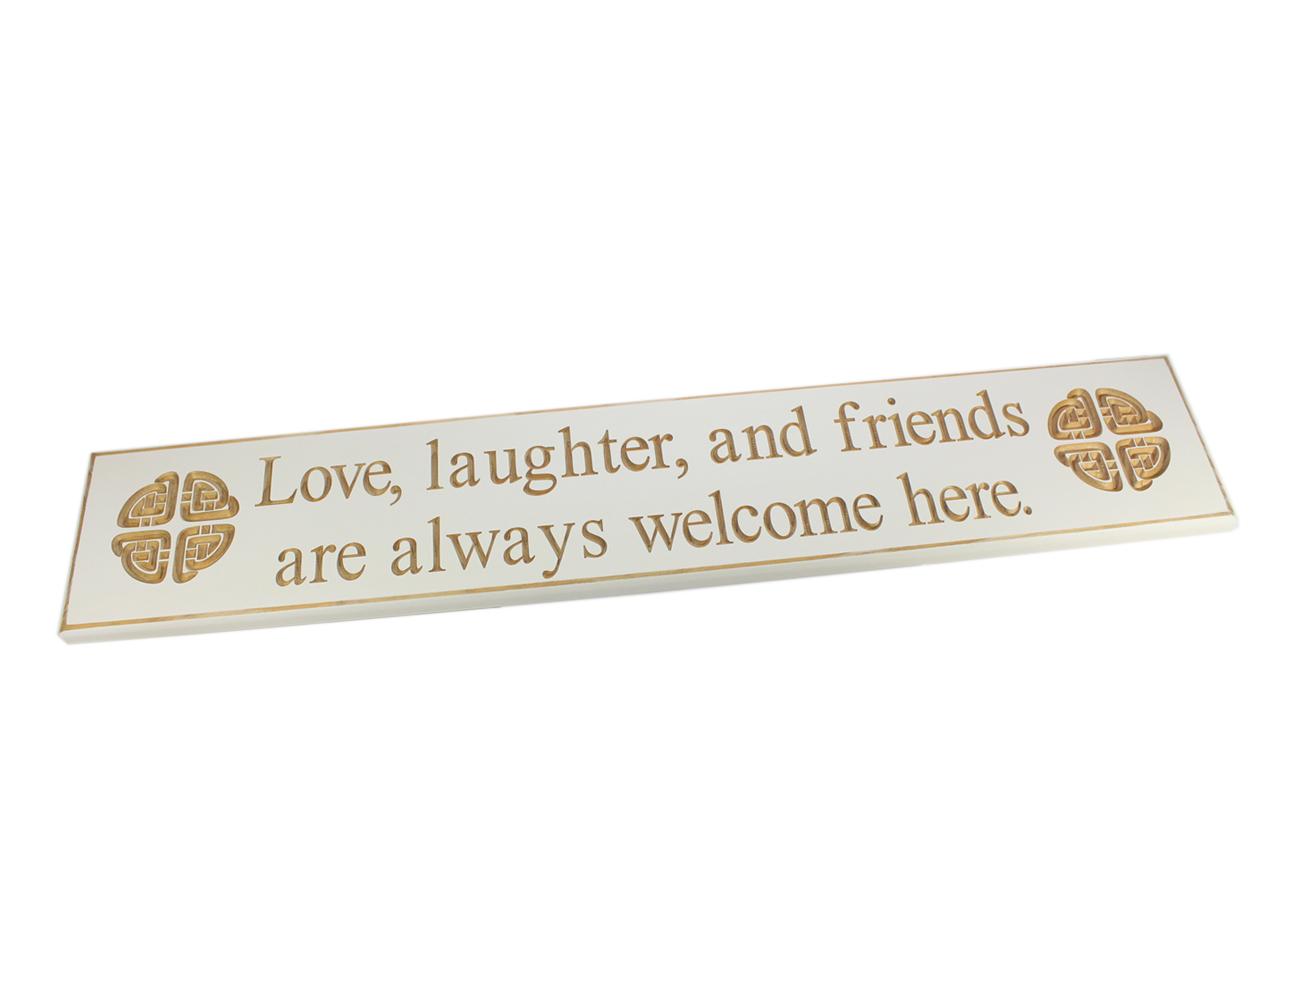 new irish sayings symbols wooden signs home decor ebay